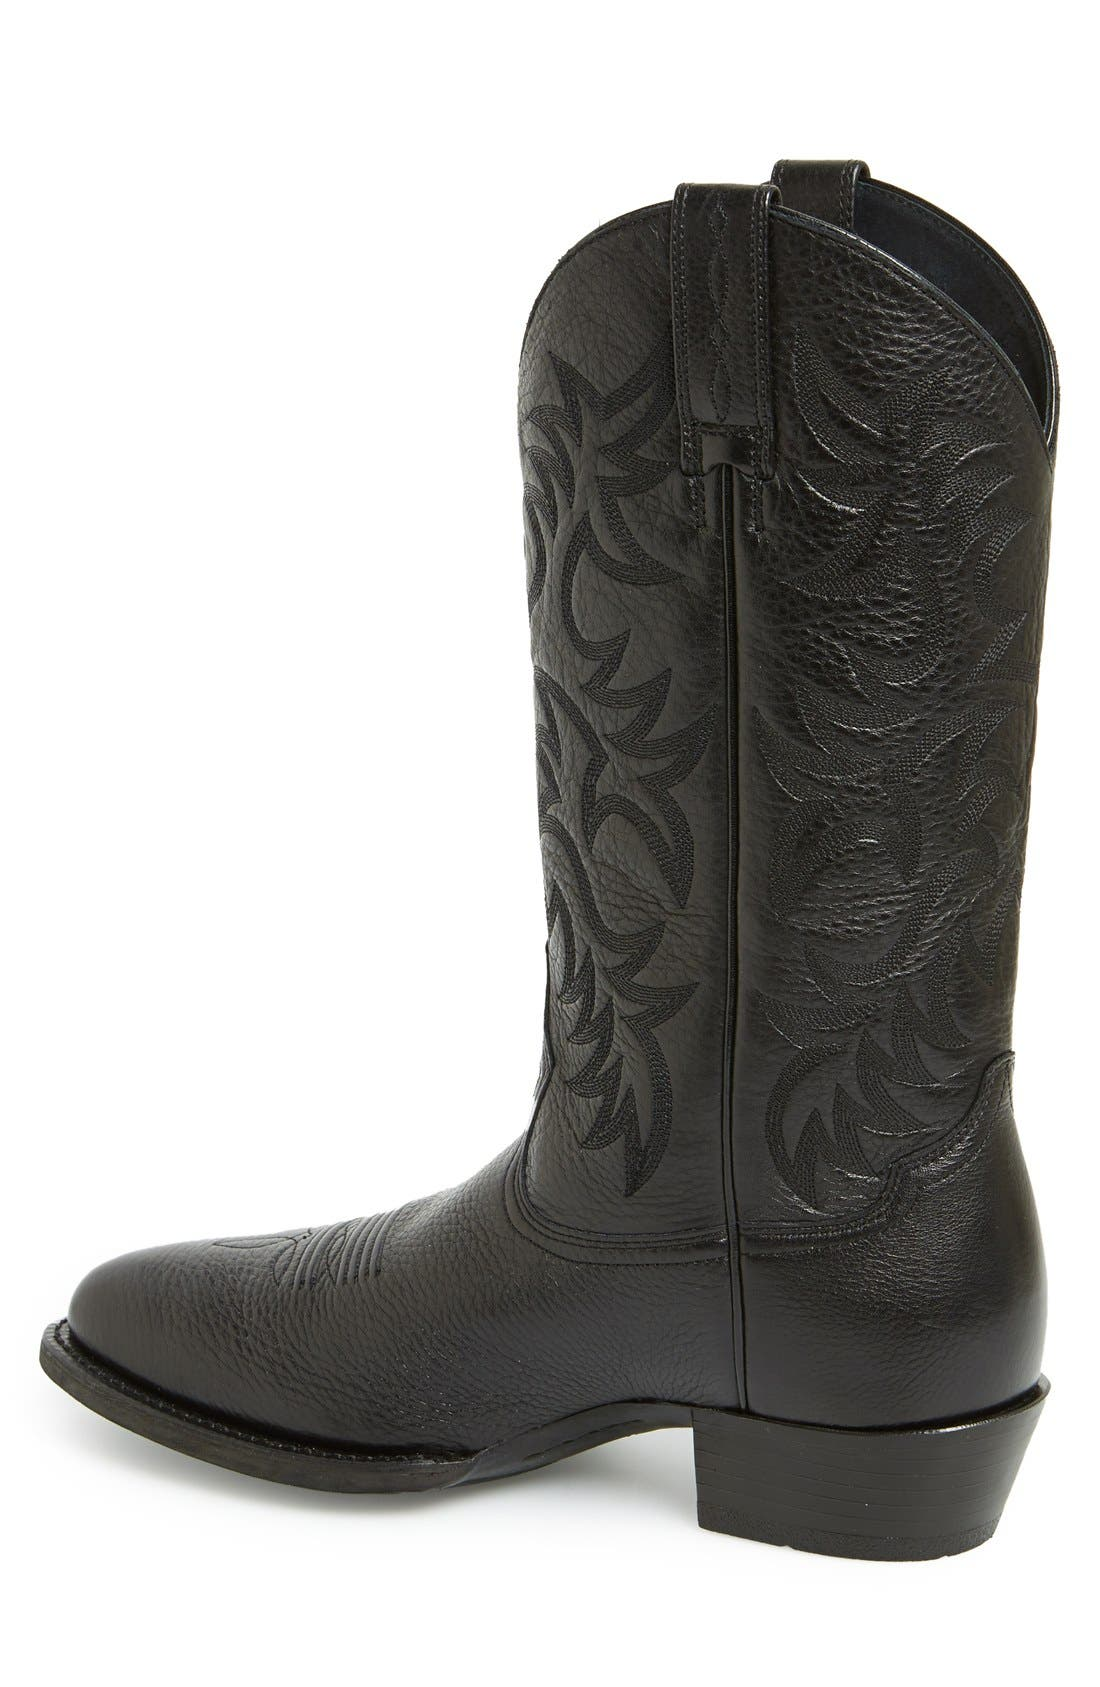 'Heritage' Leather Cowboy R-Toe Boot,                             Alternate thumbnail 2, color,                             BLACK DEERTAN